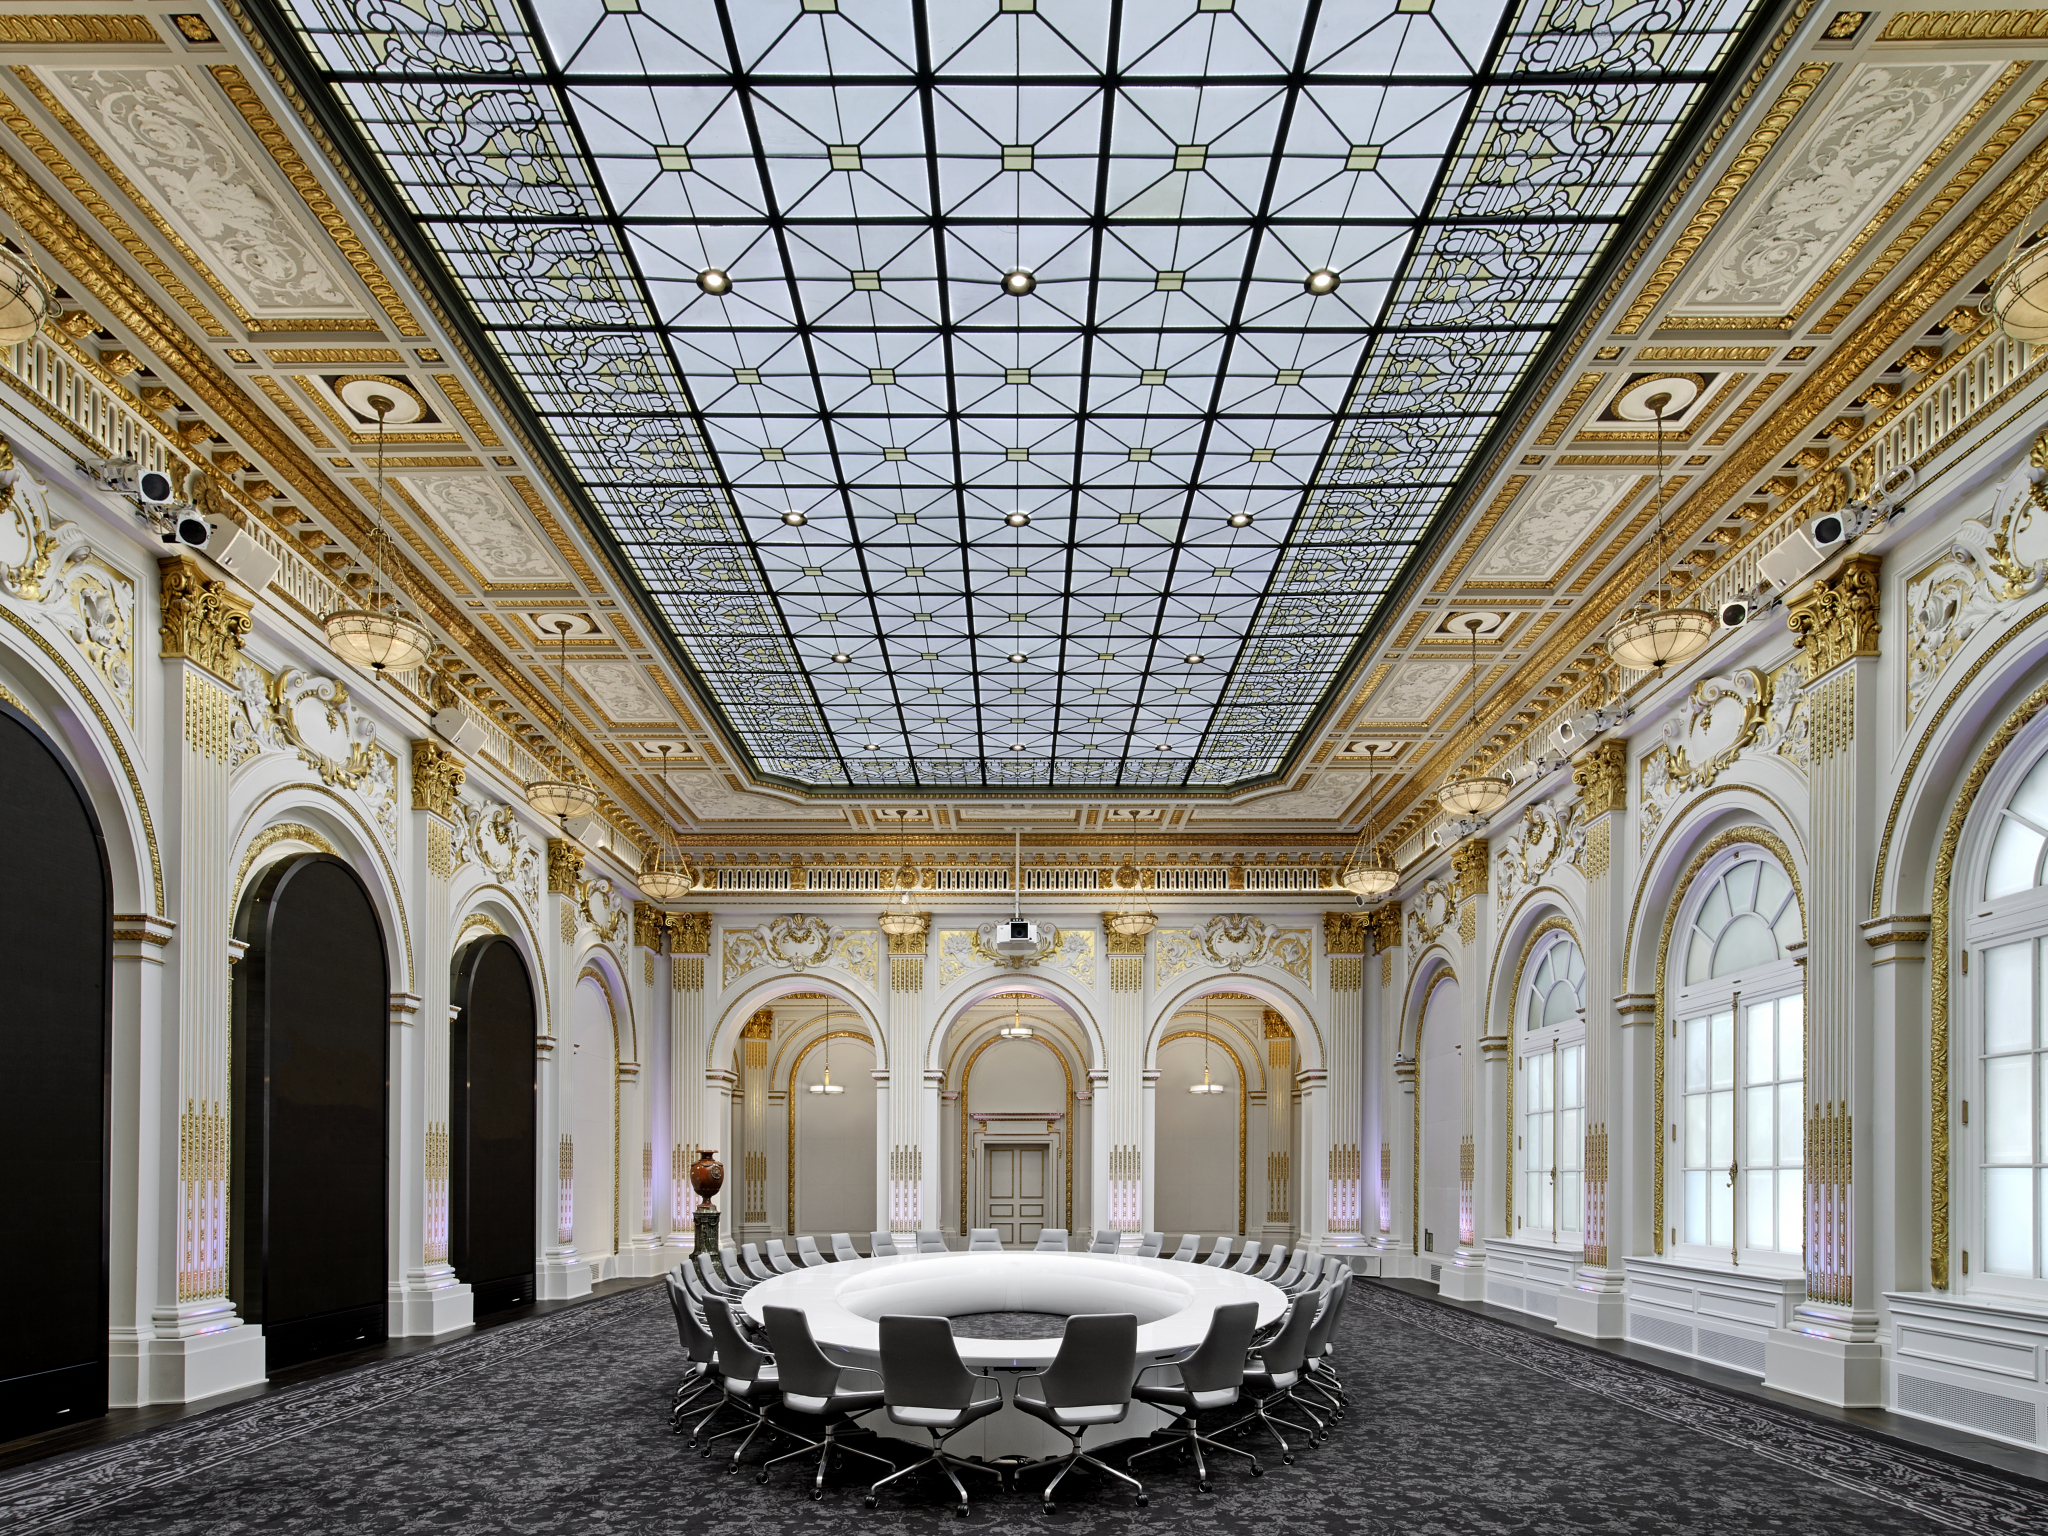 Rottet Studio interior architecture firm wins major awards & Rottet Studio interior architecture firm wins major awards - Houston ...